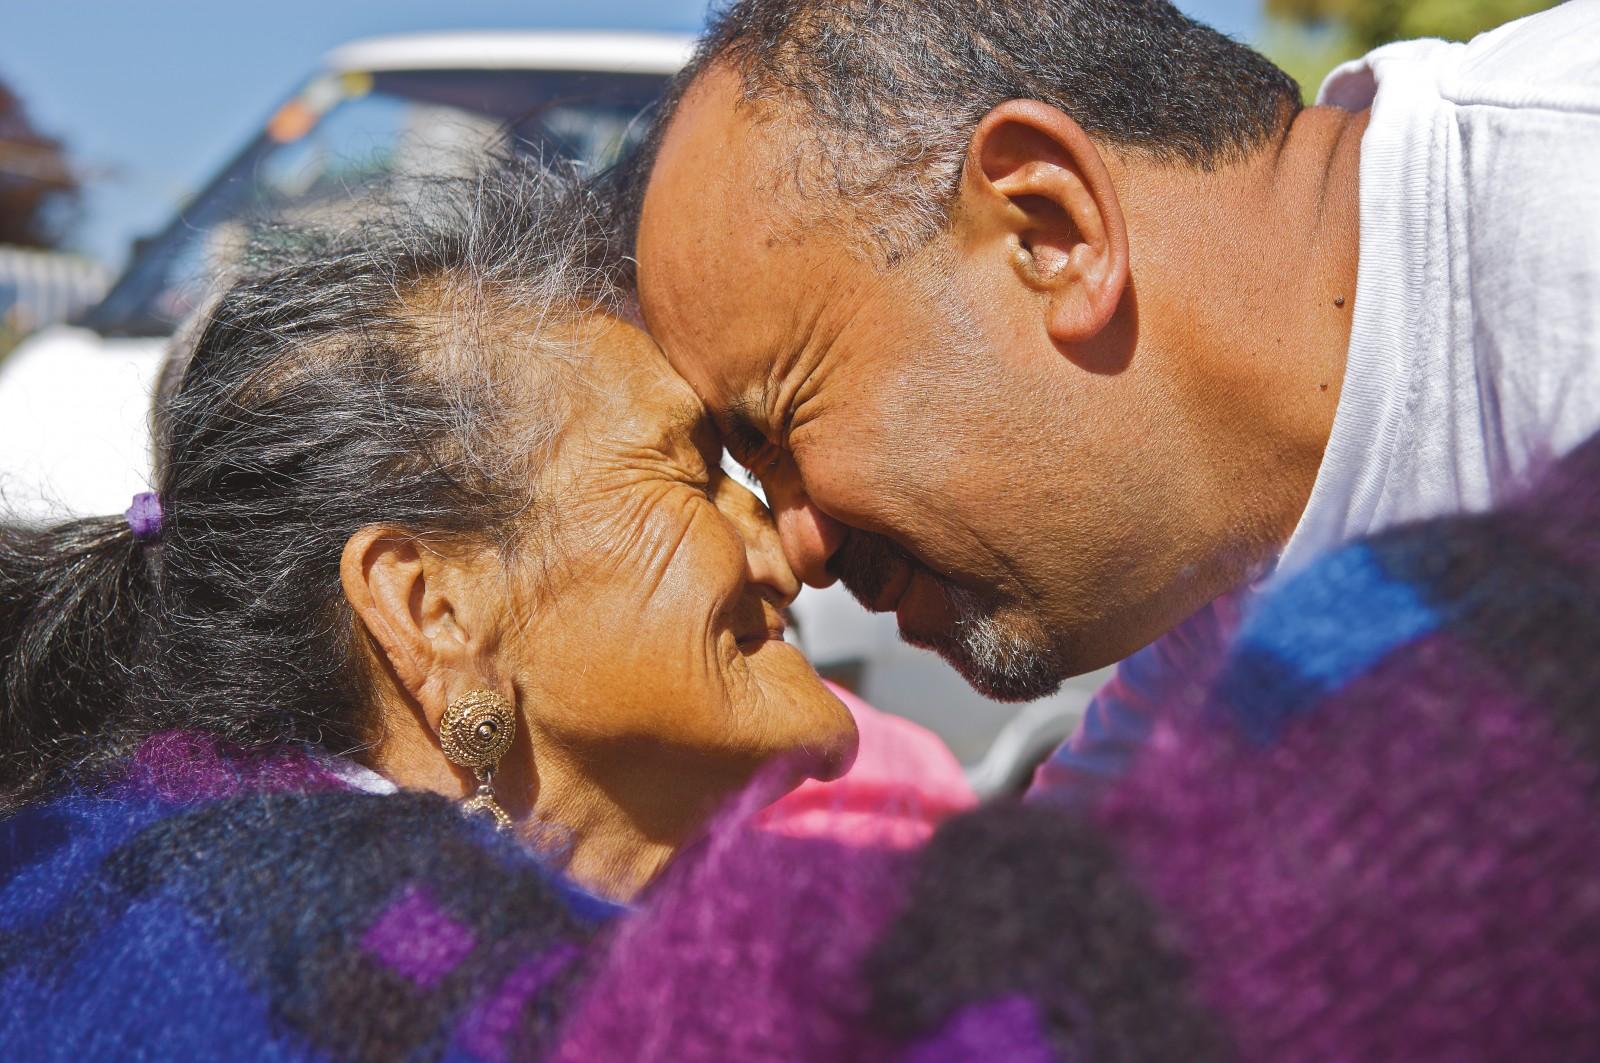 Maori Party memberslike Te Ururoa Flavell and Turia have made the Treaty ofWaitangi the touchstone for their policies, as did generations of Ratana MPs.